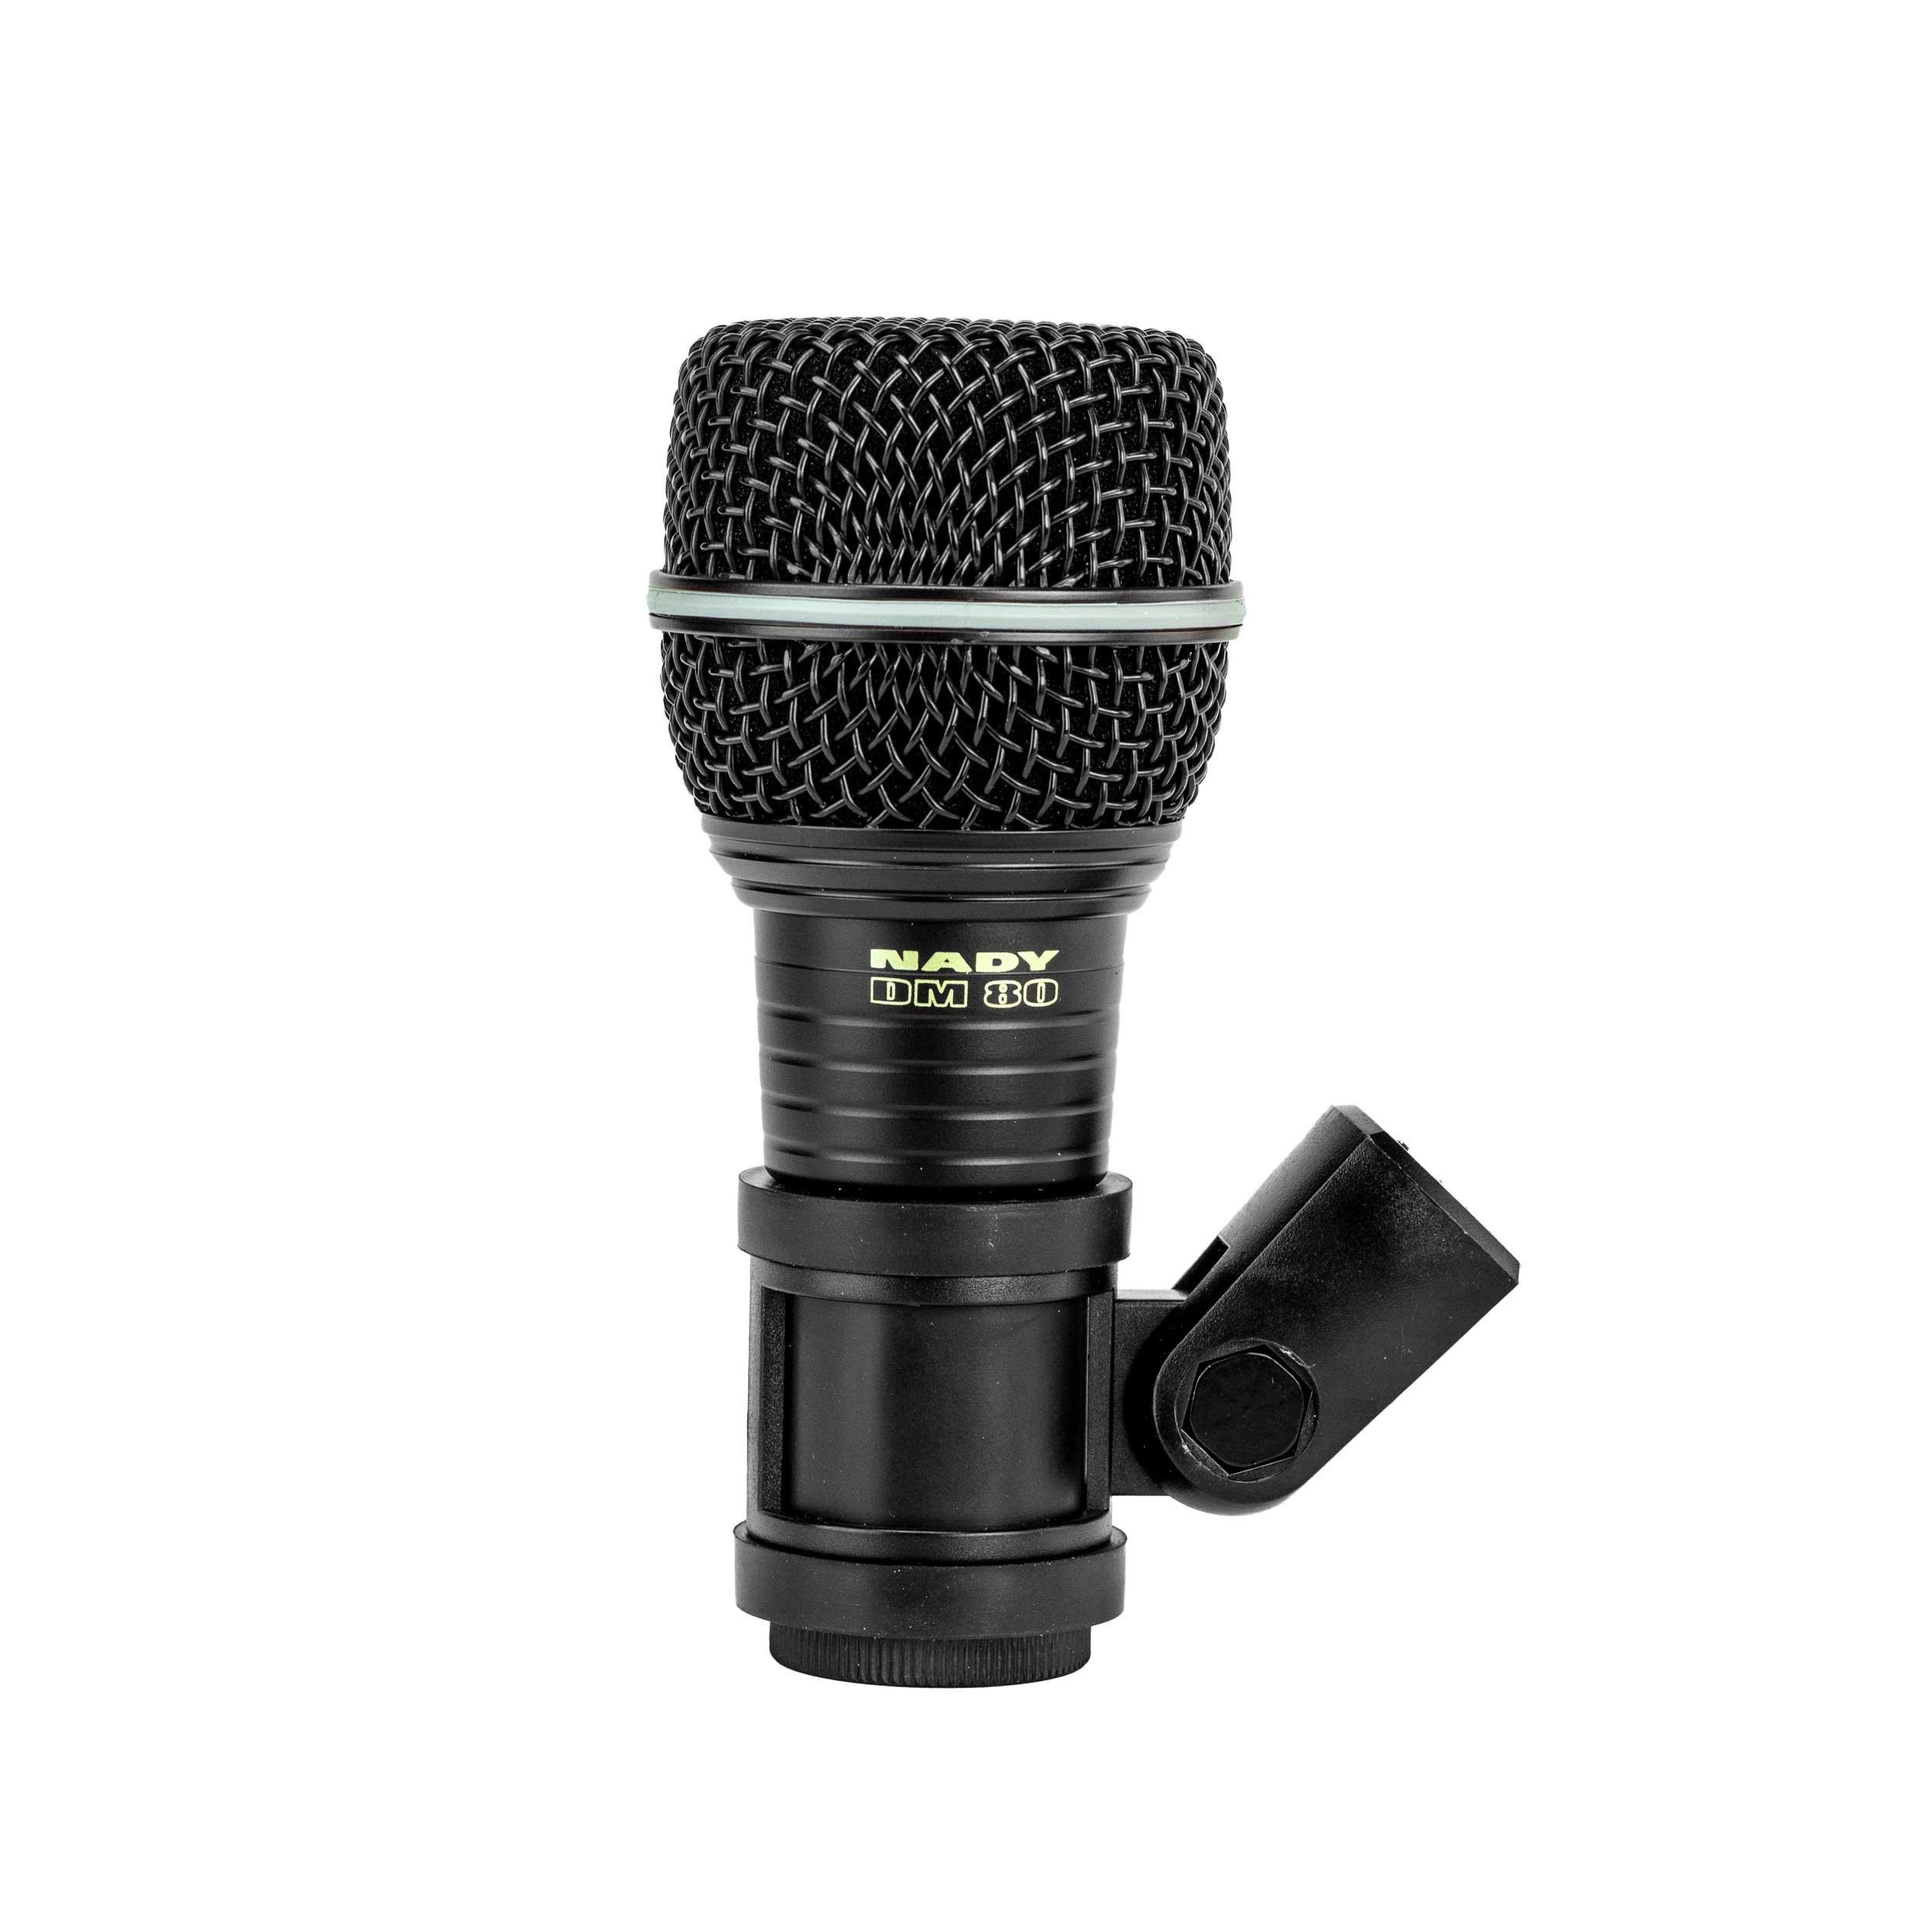 Nady DM 80 Drum Microphone construction